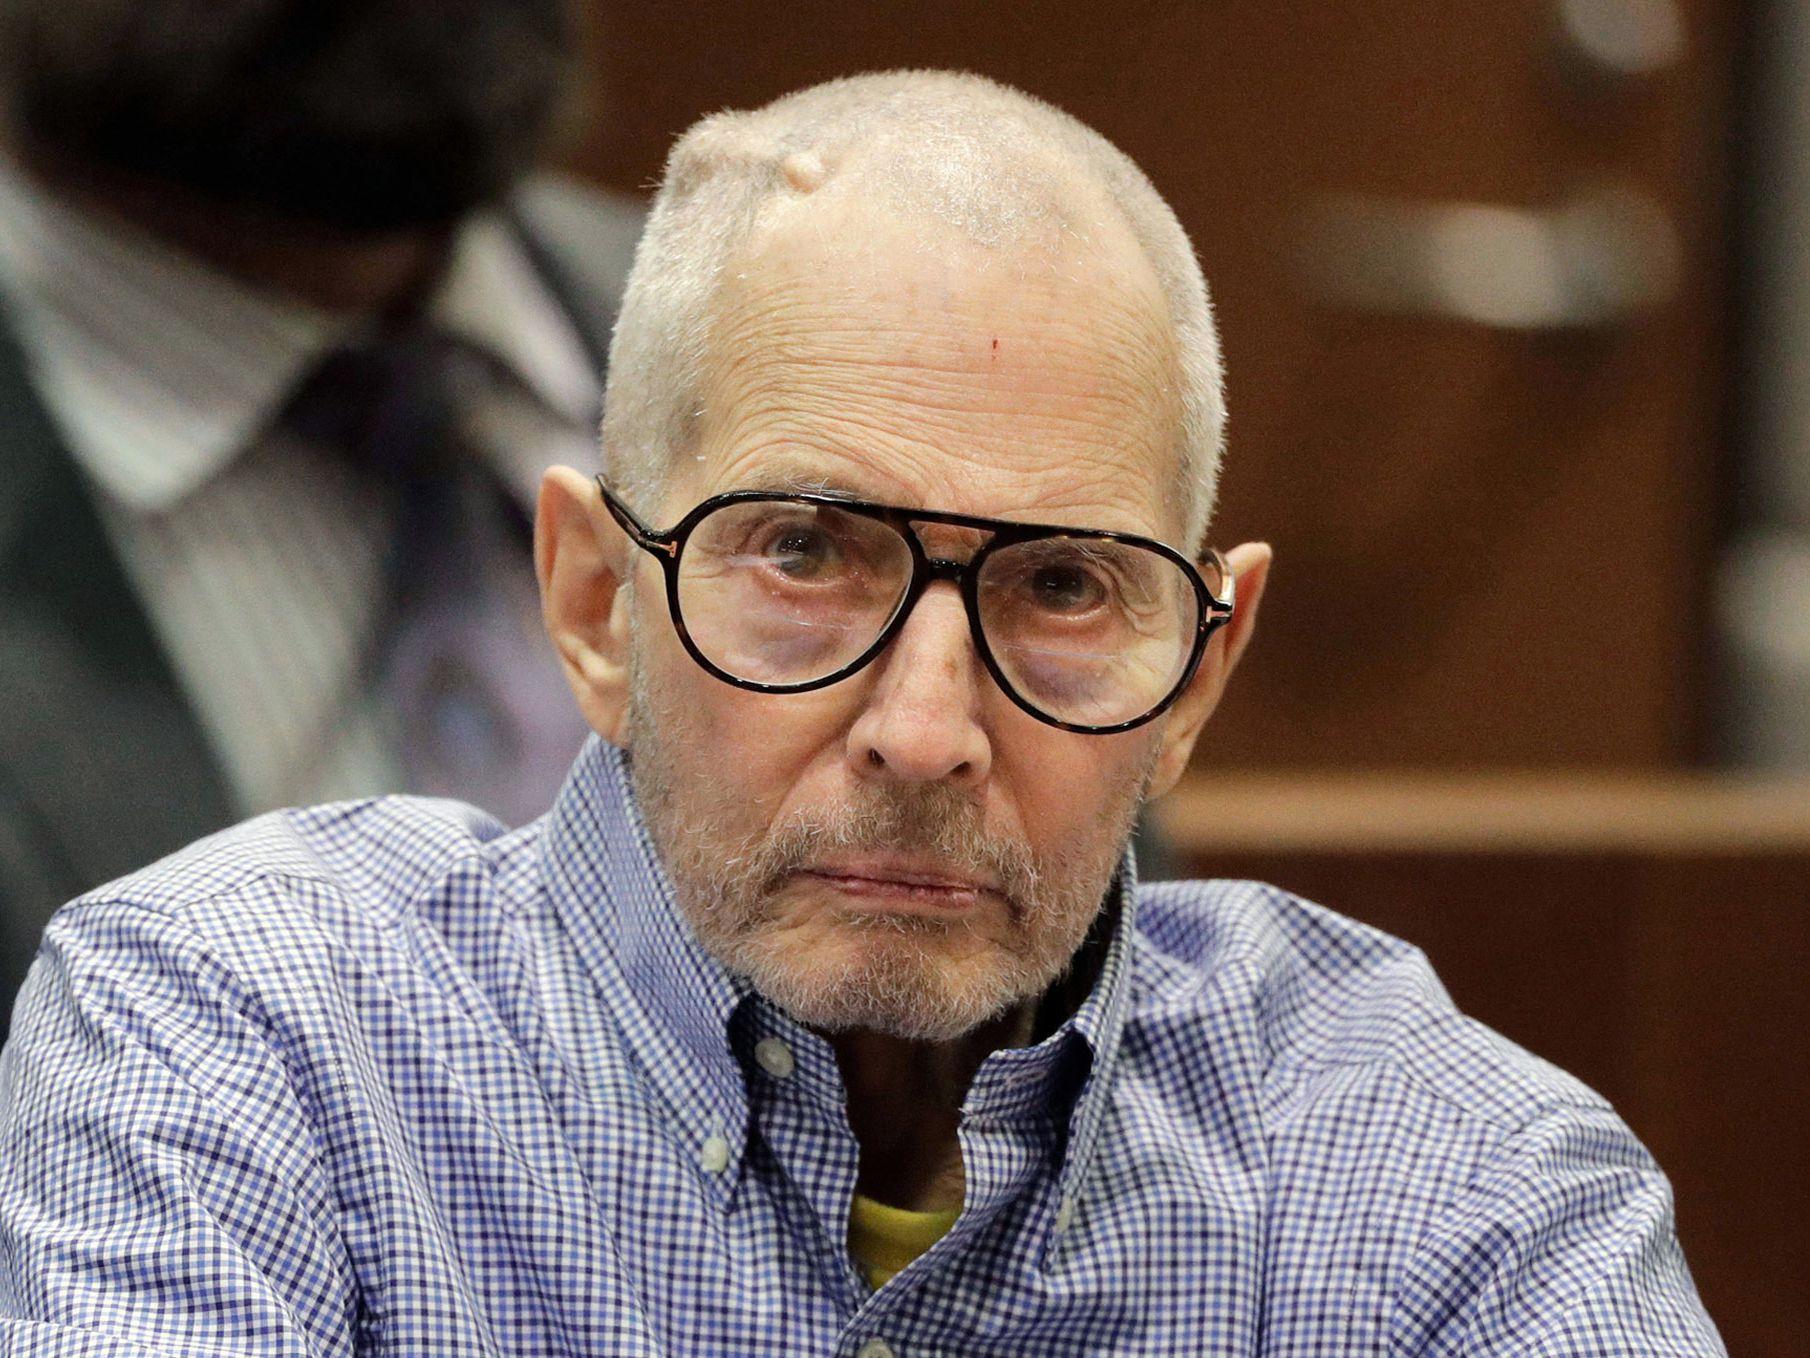 Eccentric millionaire Durst faces trial in friend's killing